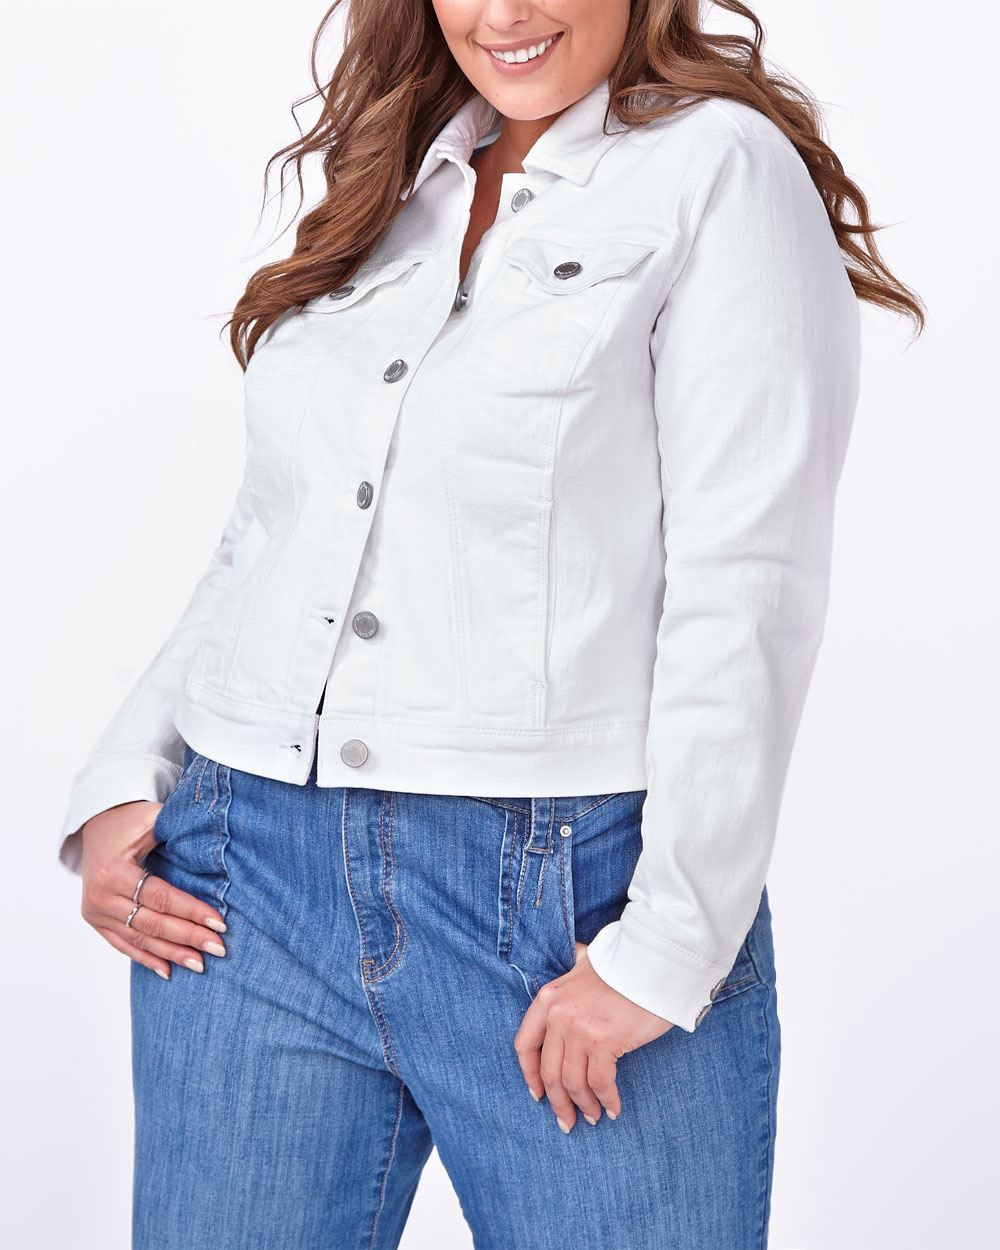 d/c JEANS White Denim Jacket